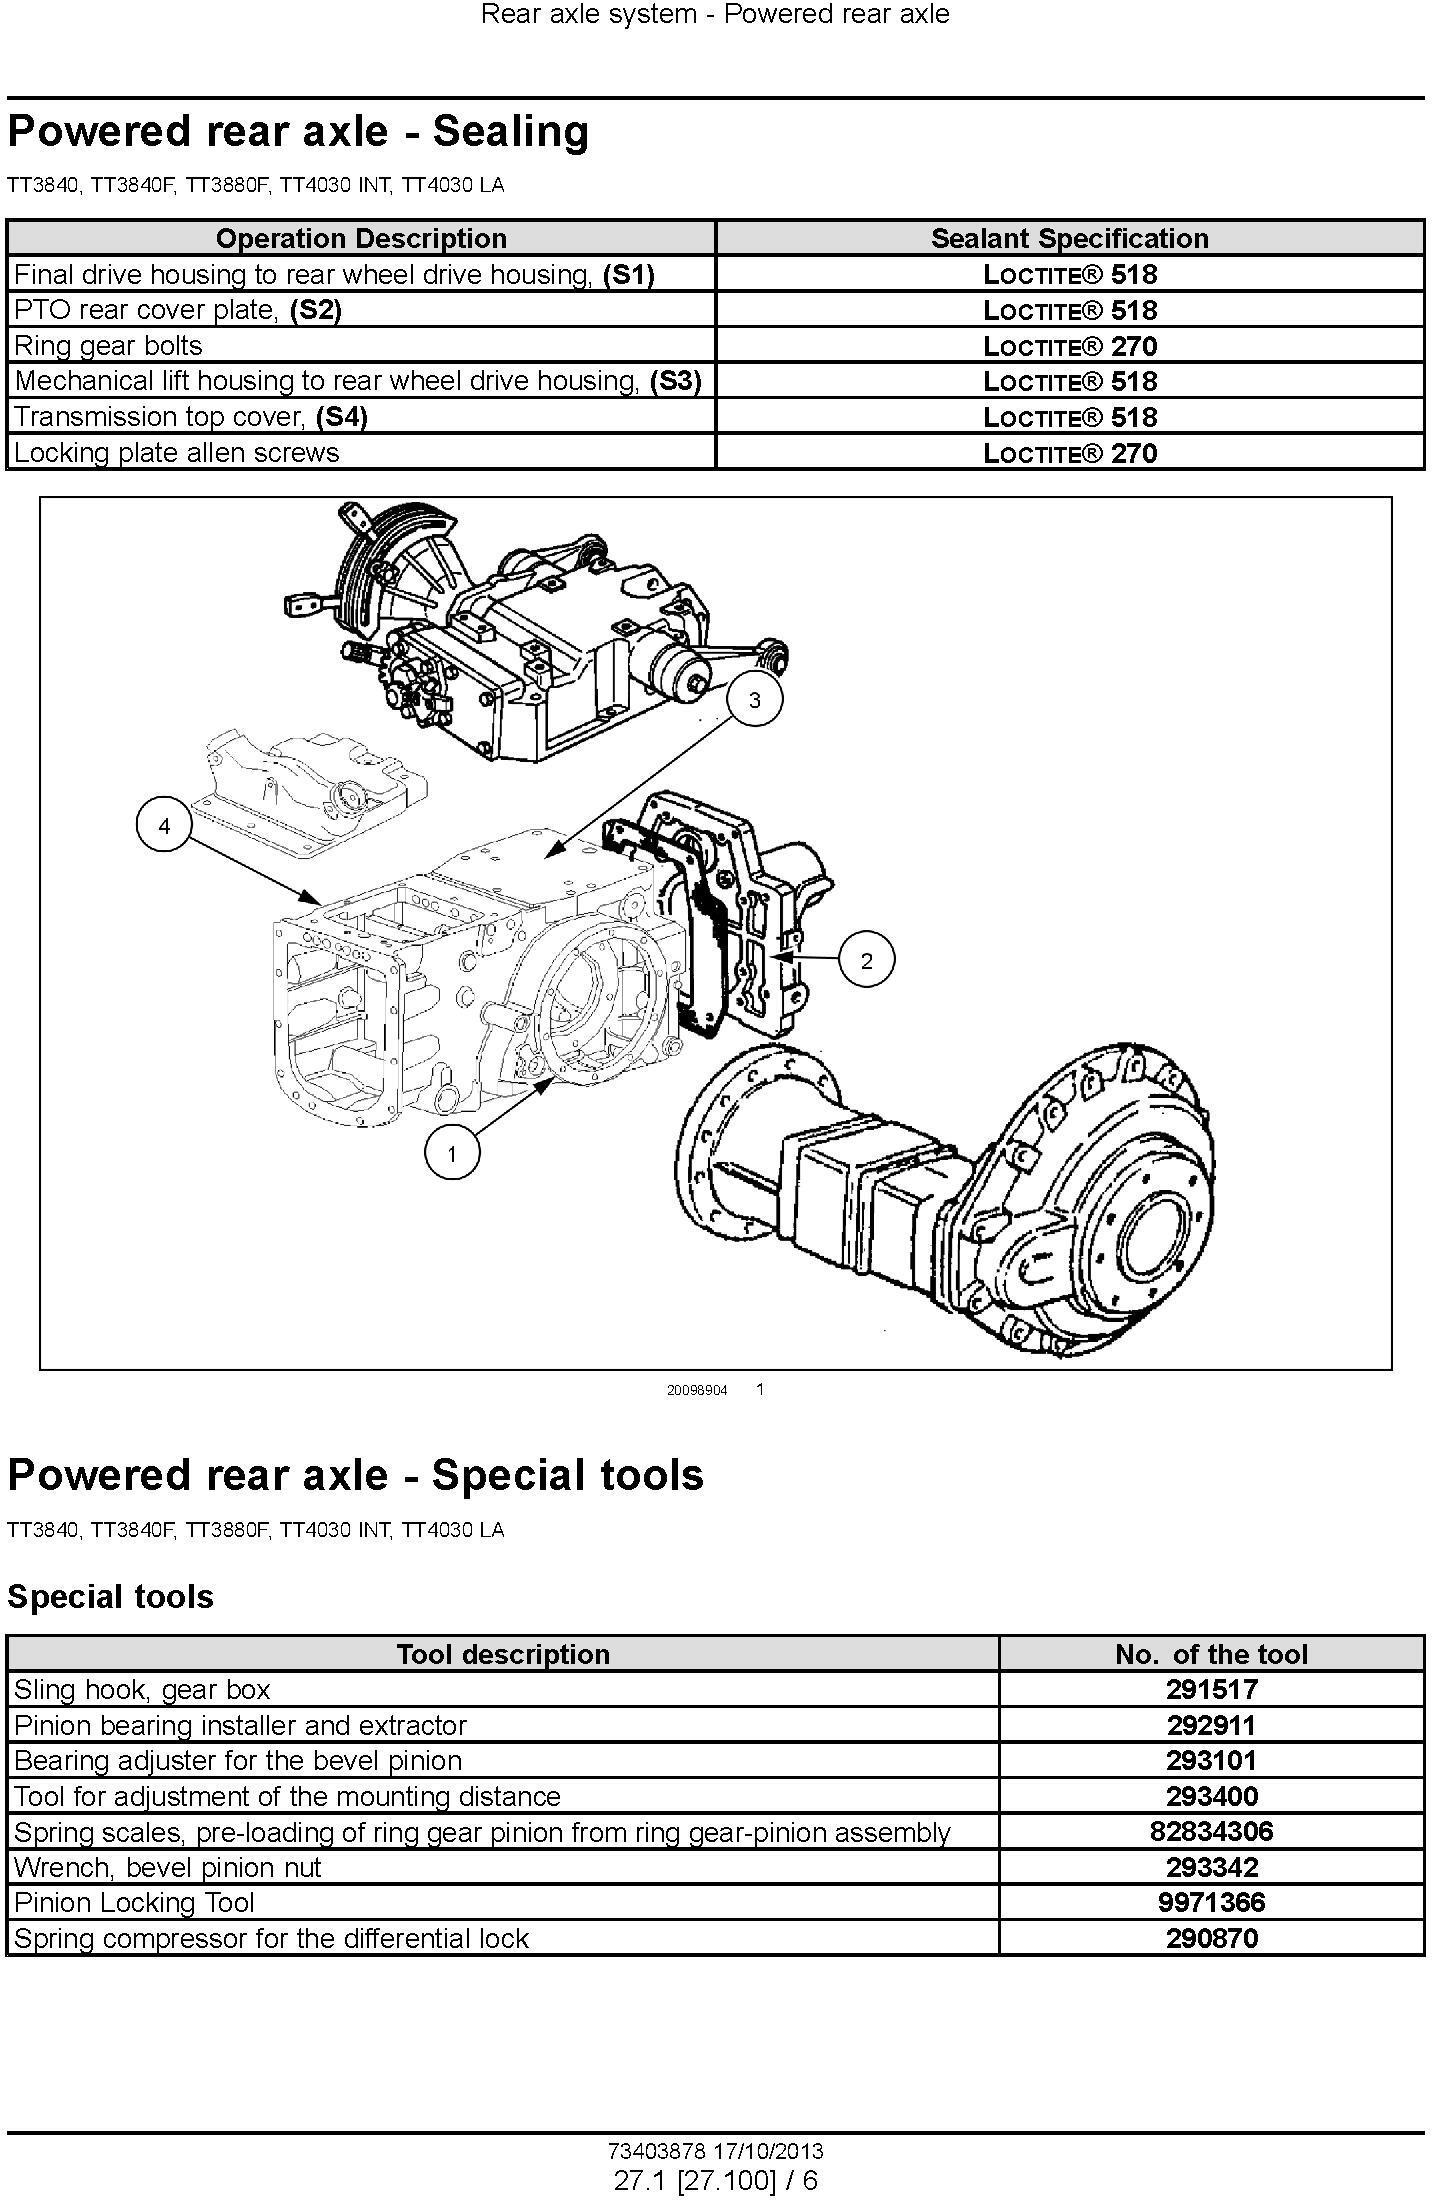 New Holland TT3840, TT3840F, TT3880F, TT4030 Tractors Service Manual - 3